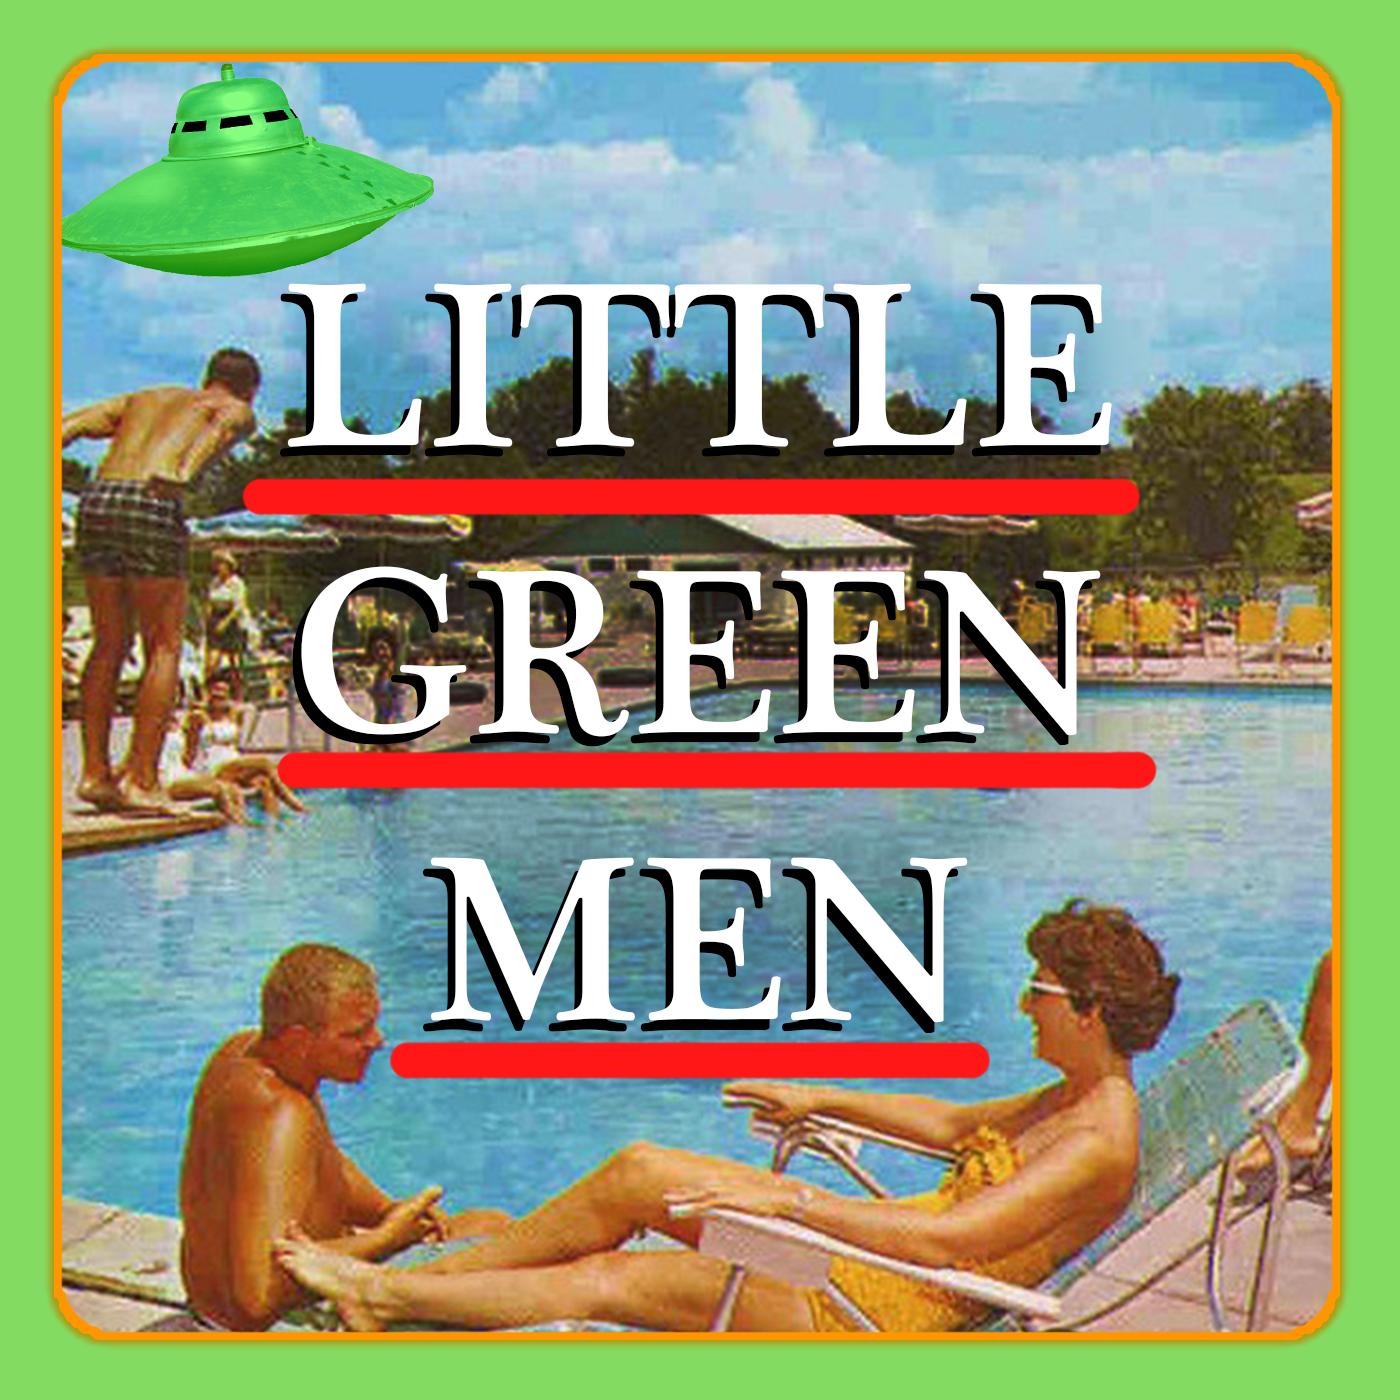 little_green_men_album_cover.png